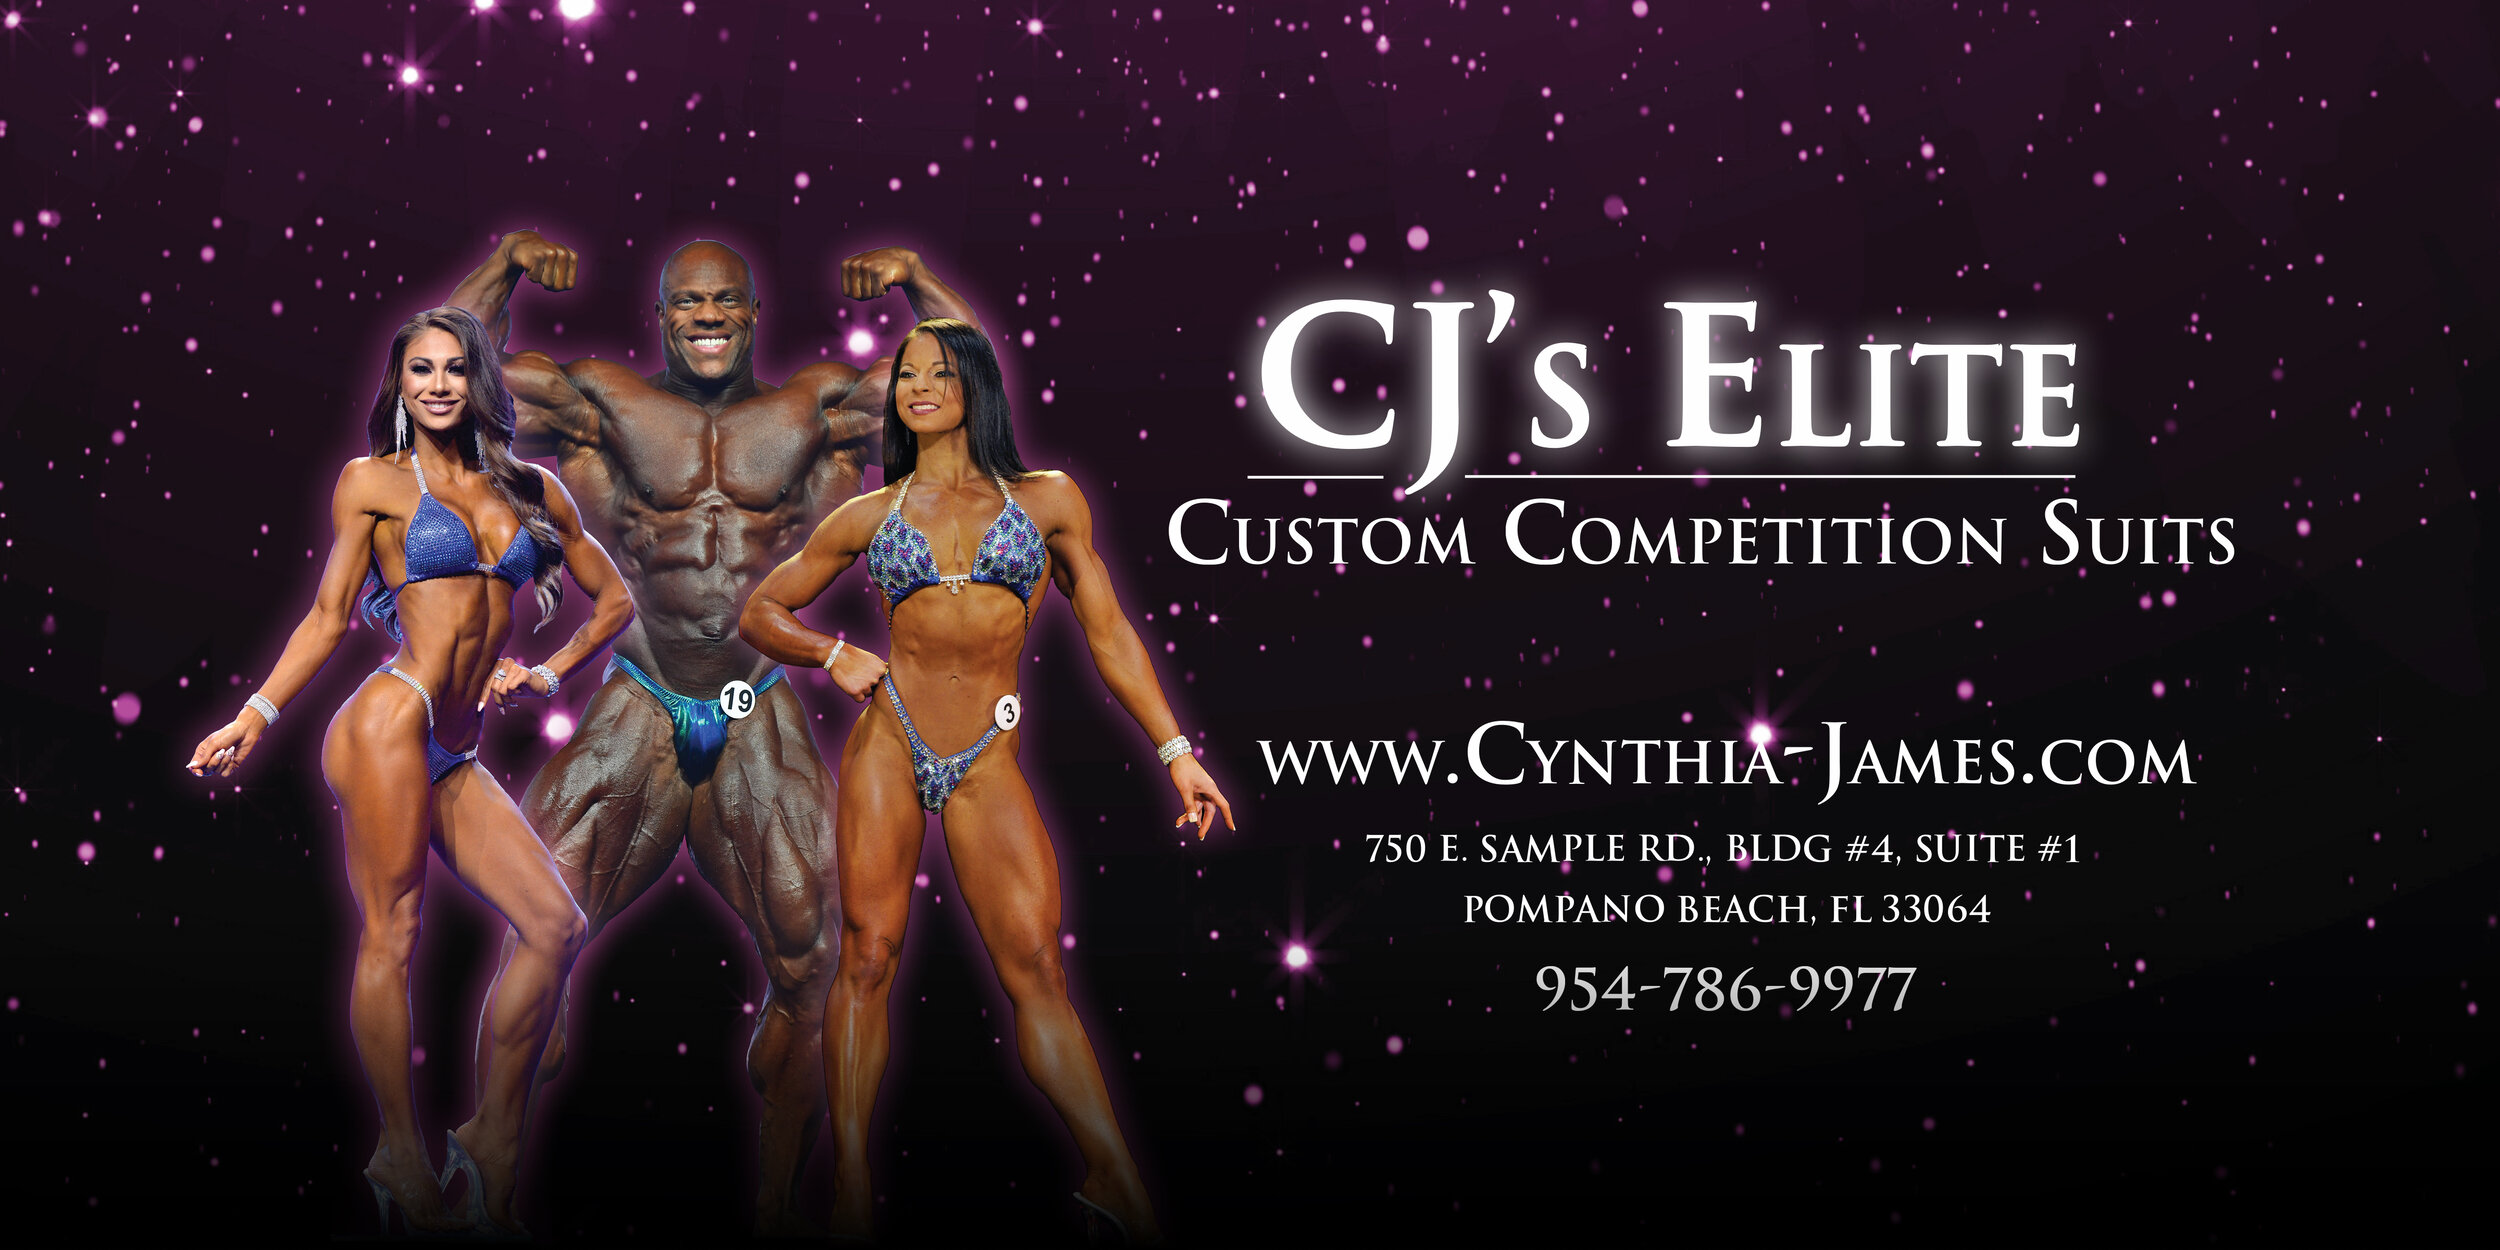 CJ's Elite Custom Competition Suits